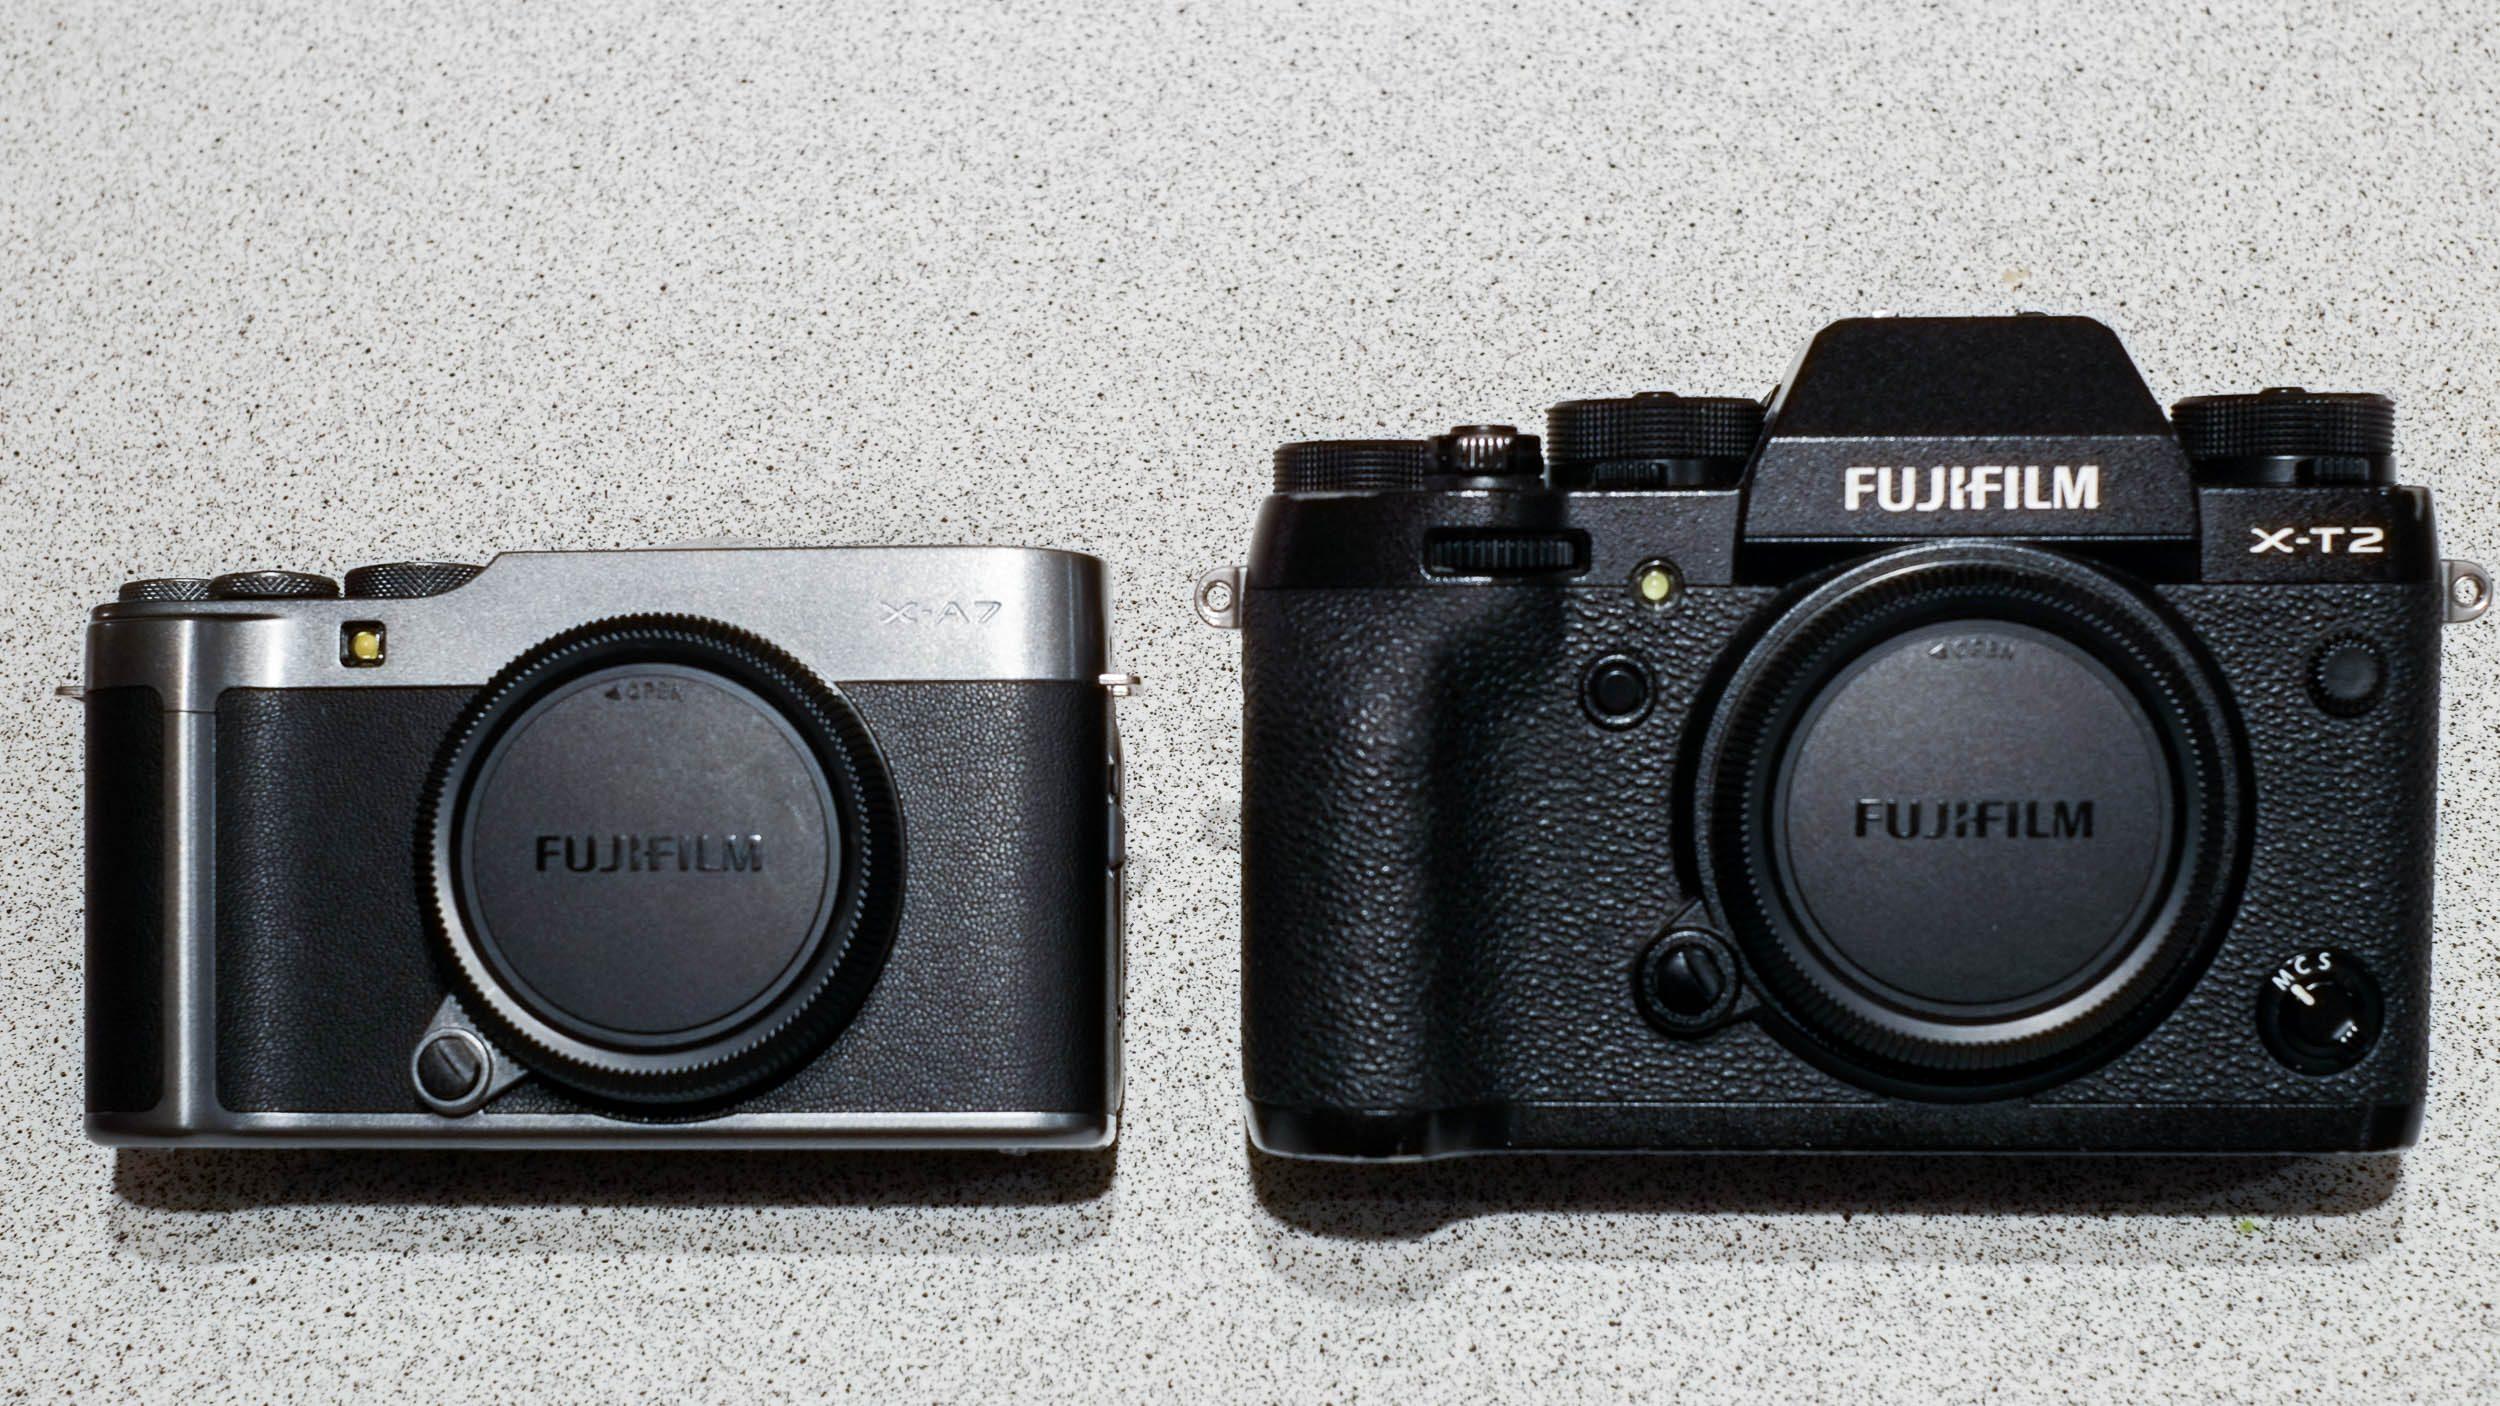 Vergleich Fujifilm X-A7 und Fujifilm X-T2